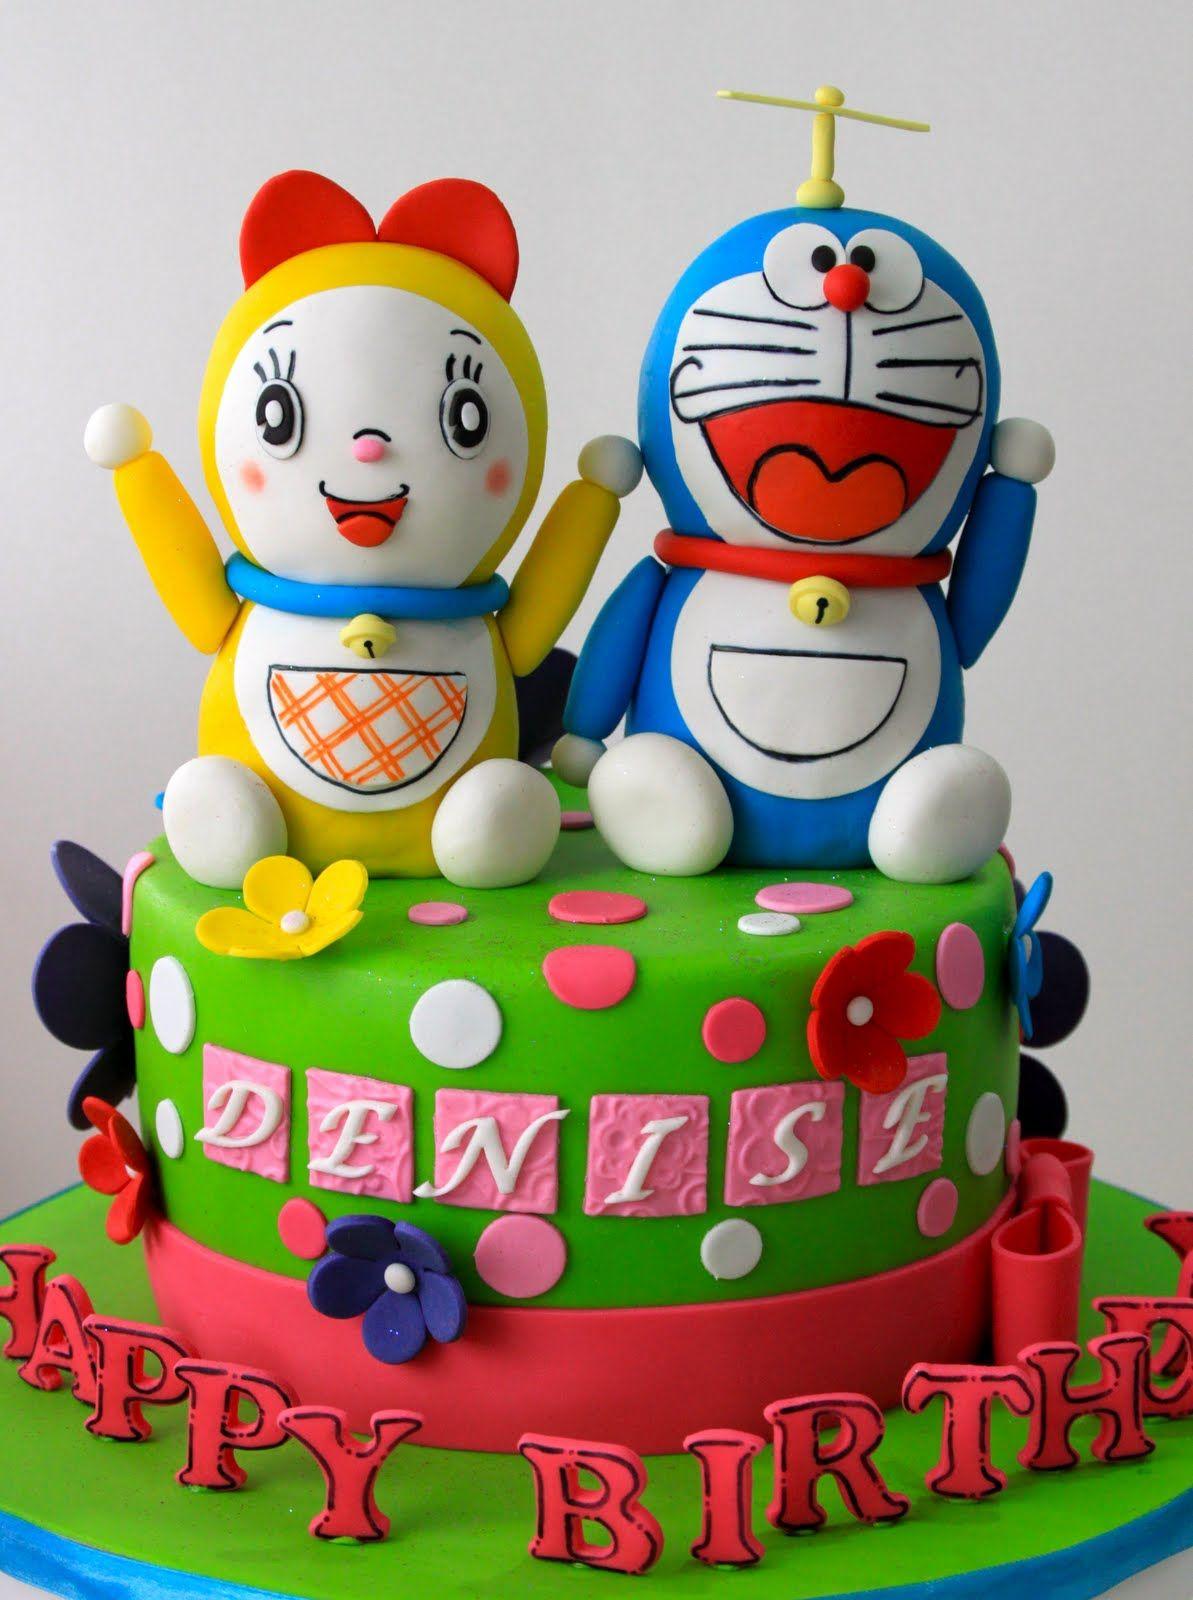 Celebrate With Cake Doraemon And Dorami Cake Doraemon